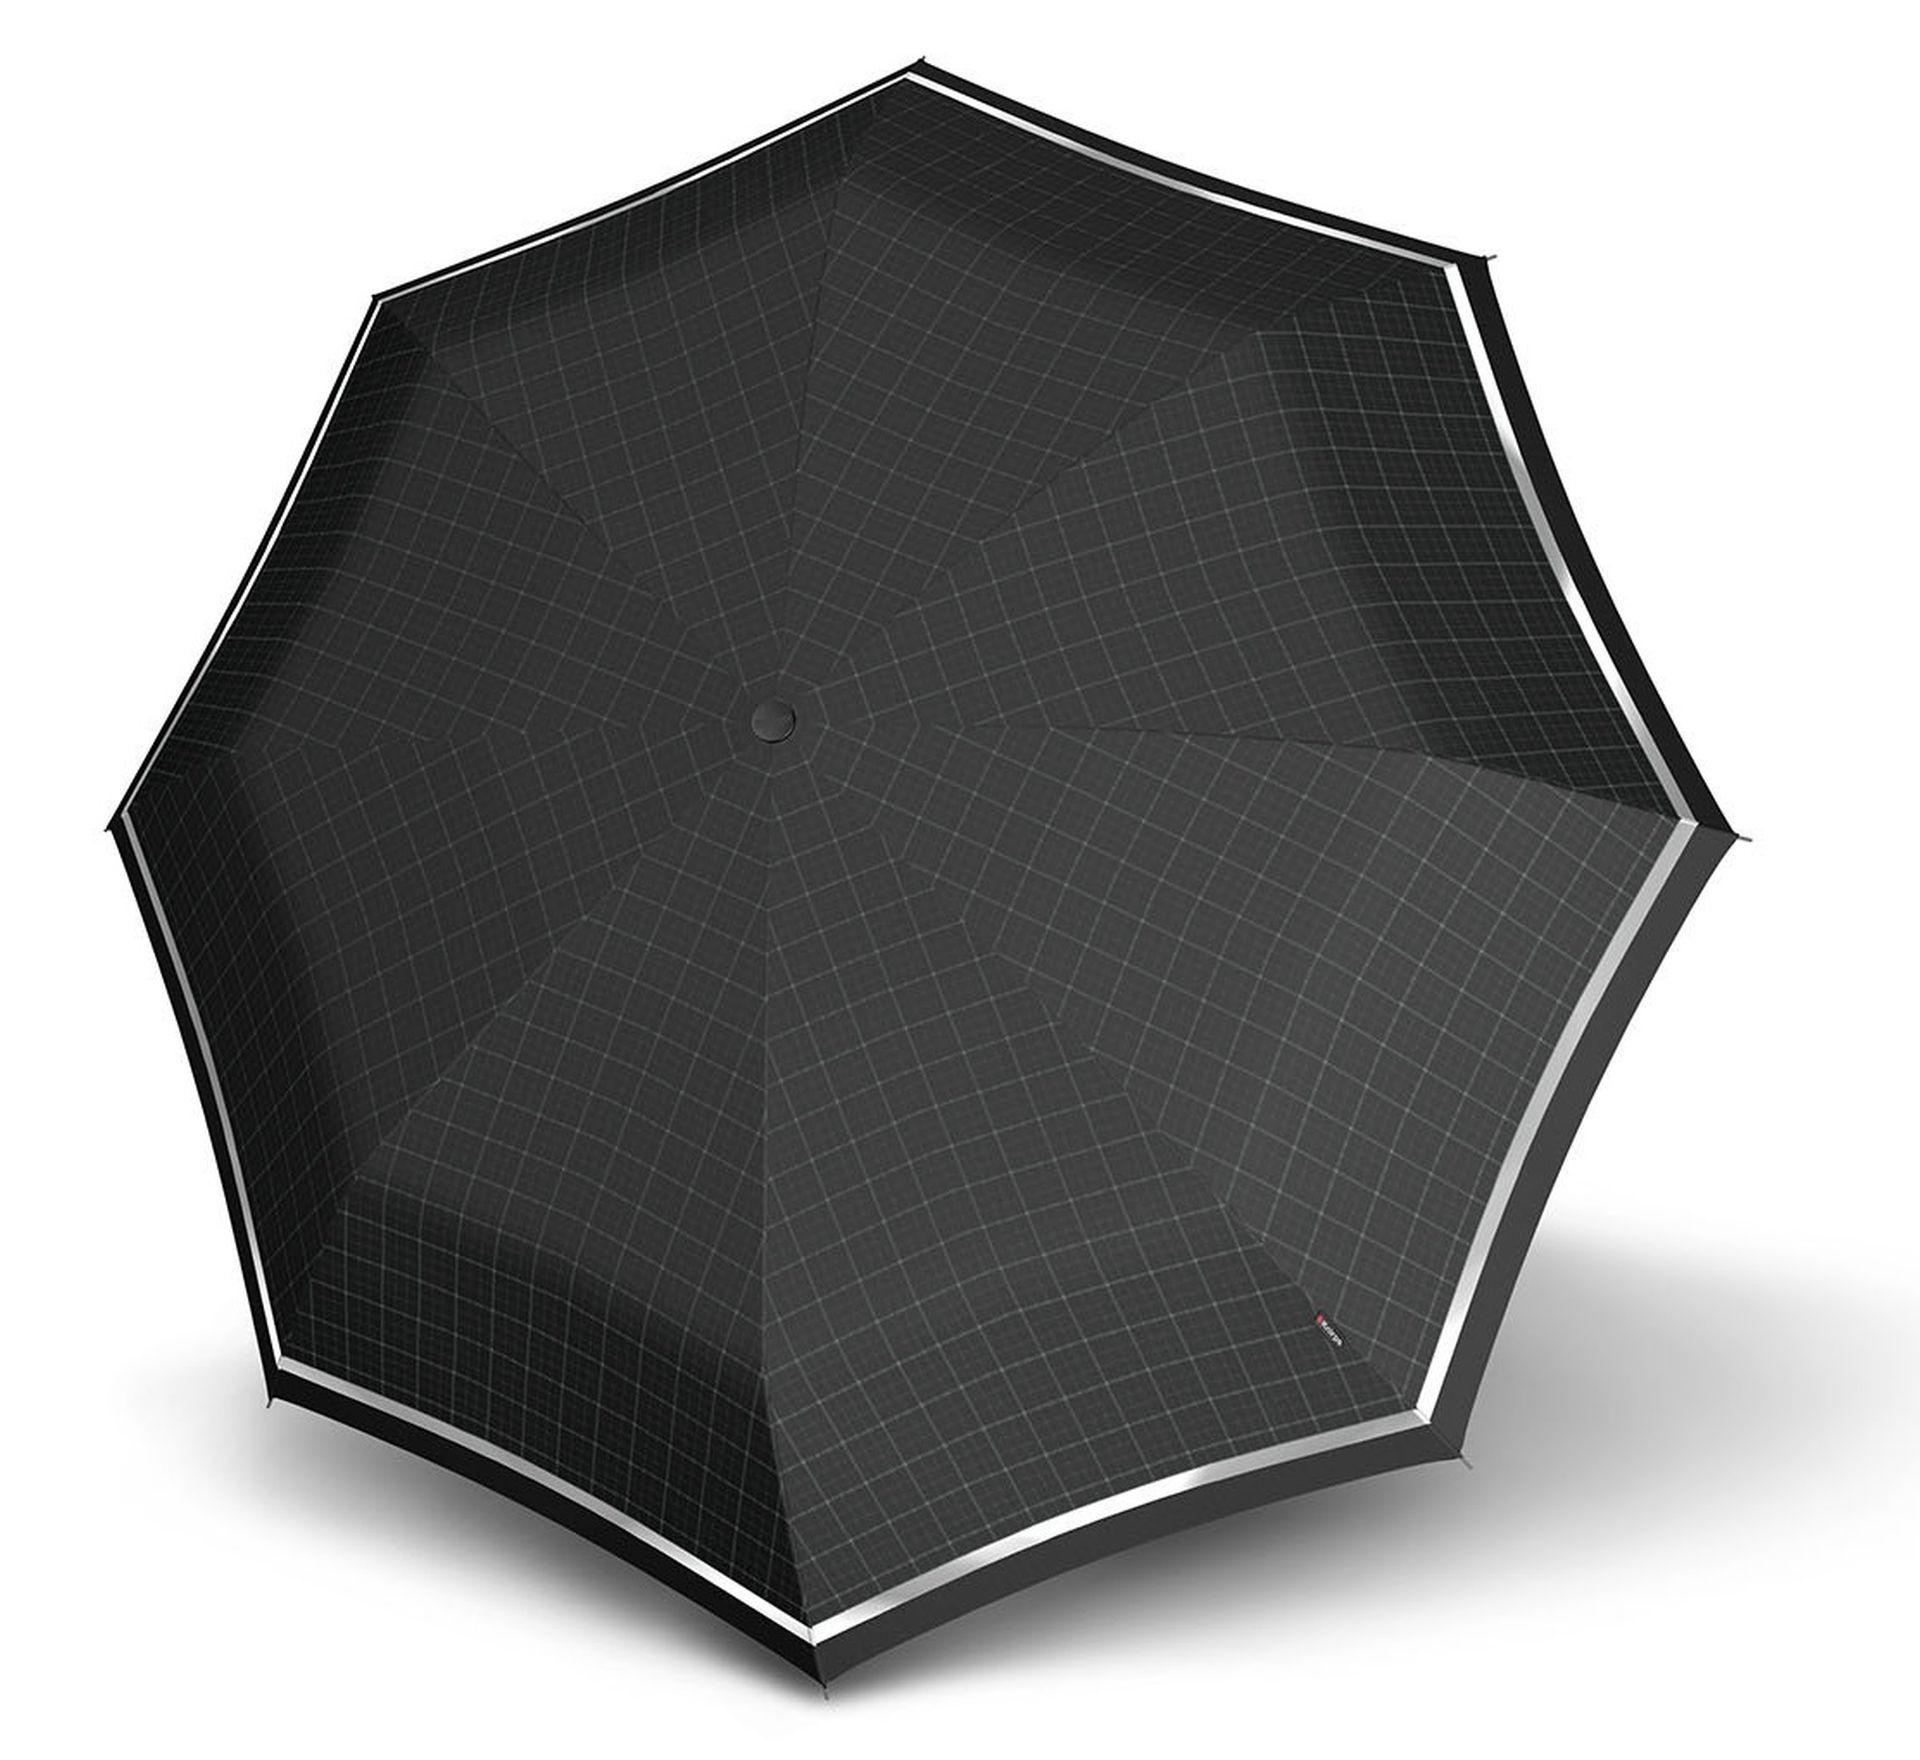 knirps fiber t2 duomatic reflect regenschirm taschenschirm. Black Bedroom Furniture Sets. Home Design Ideas